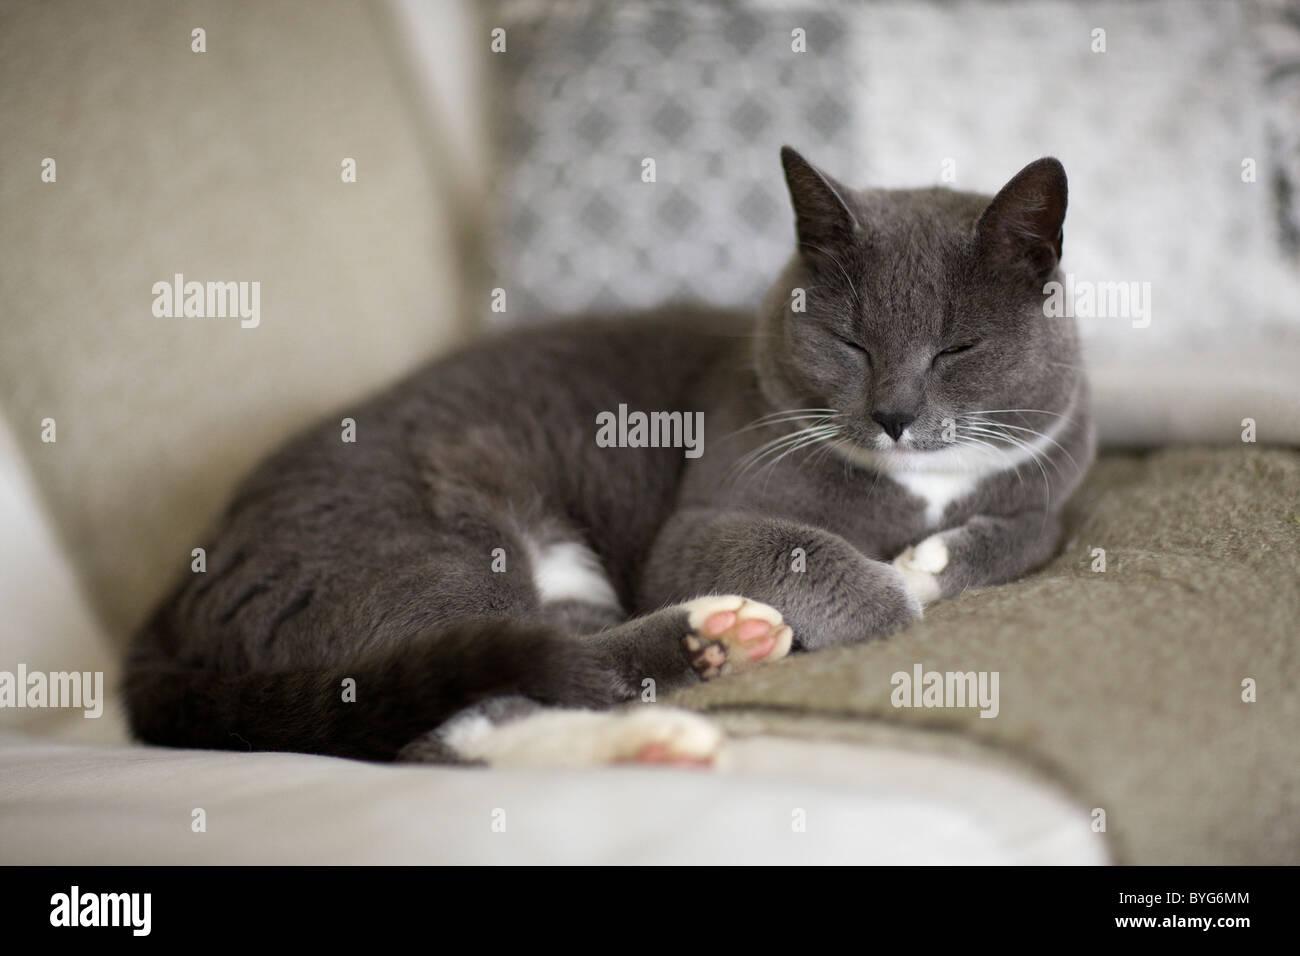 Cat sleeping on sofa - Stock Image